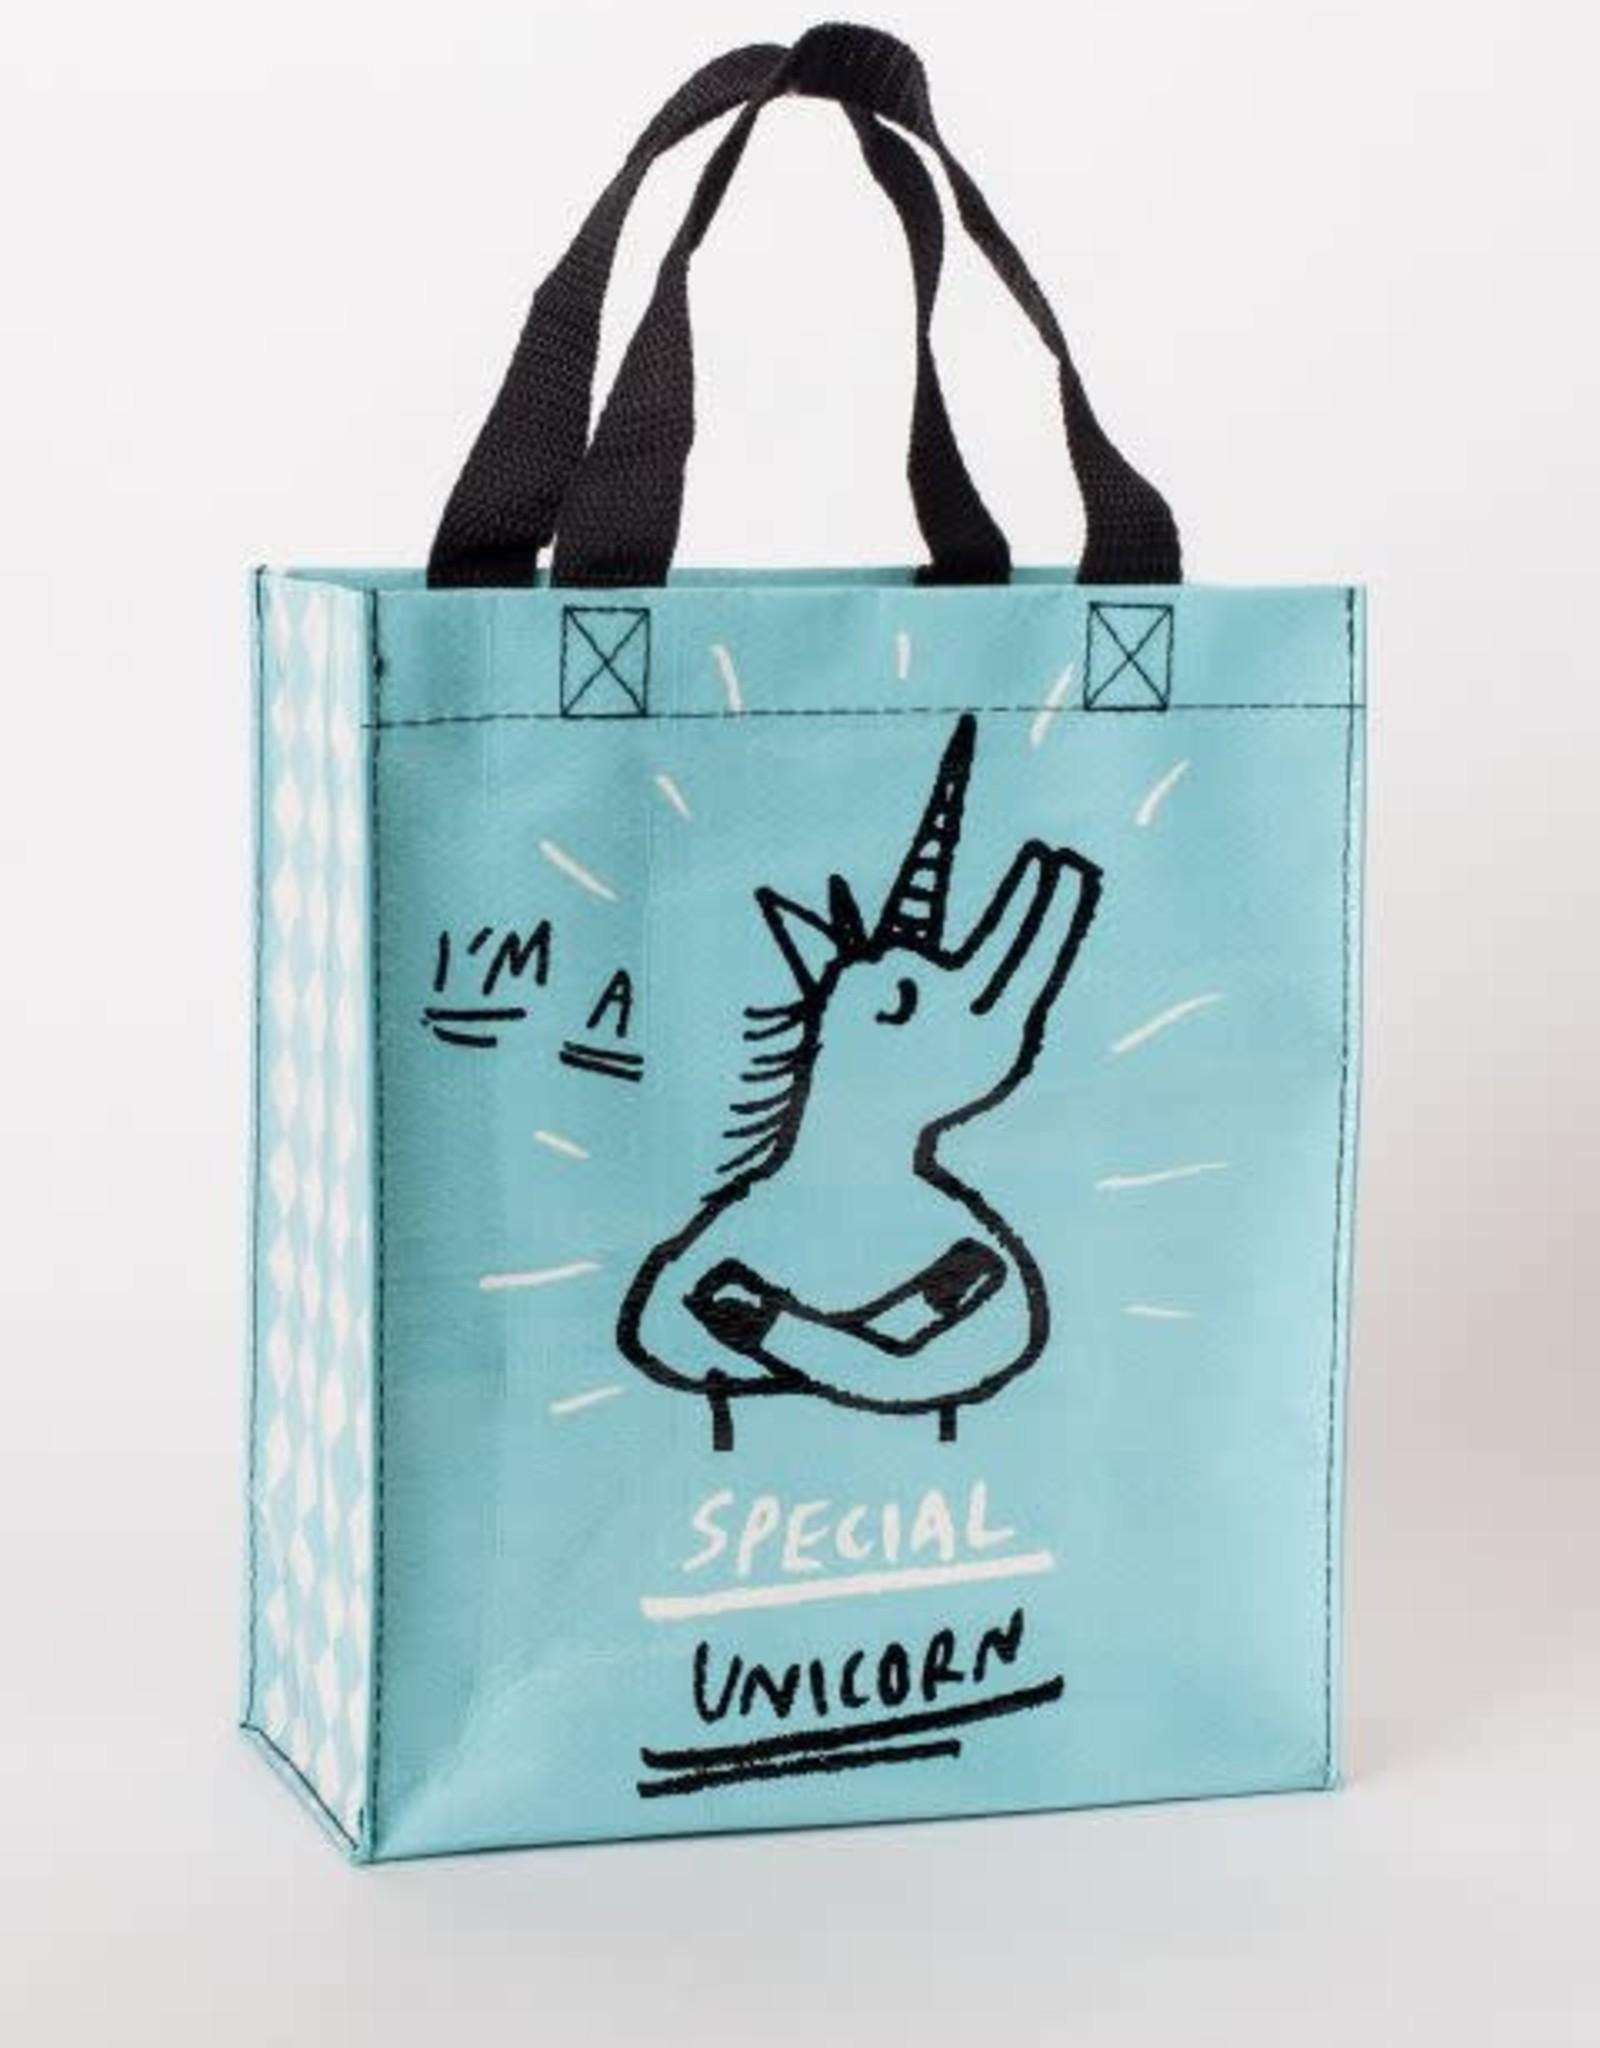 Special Unicorn Handy Tote